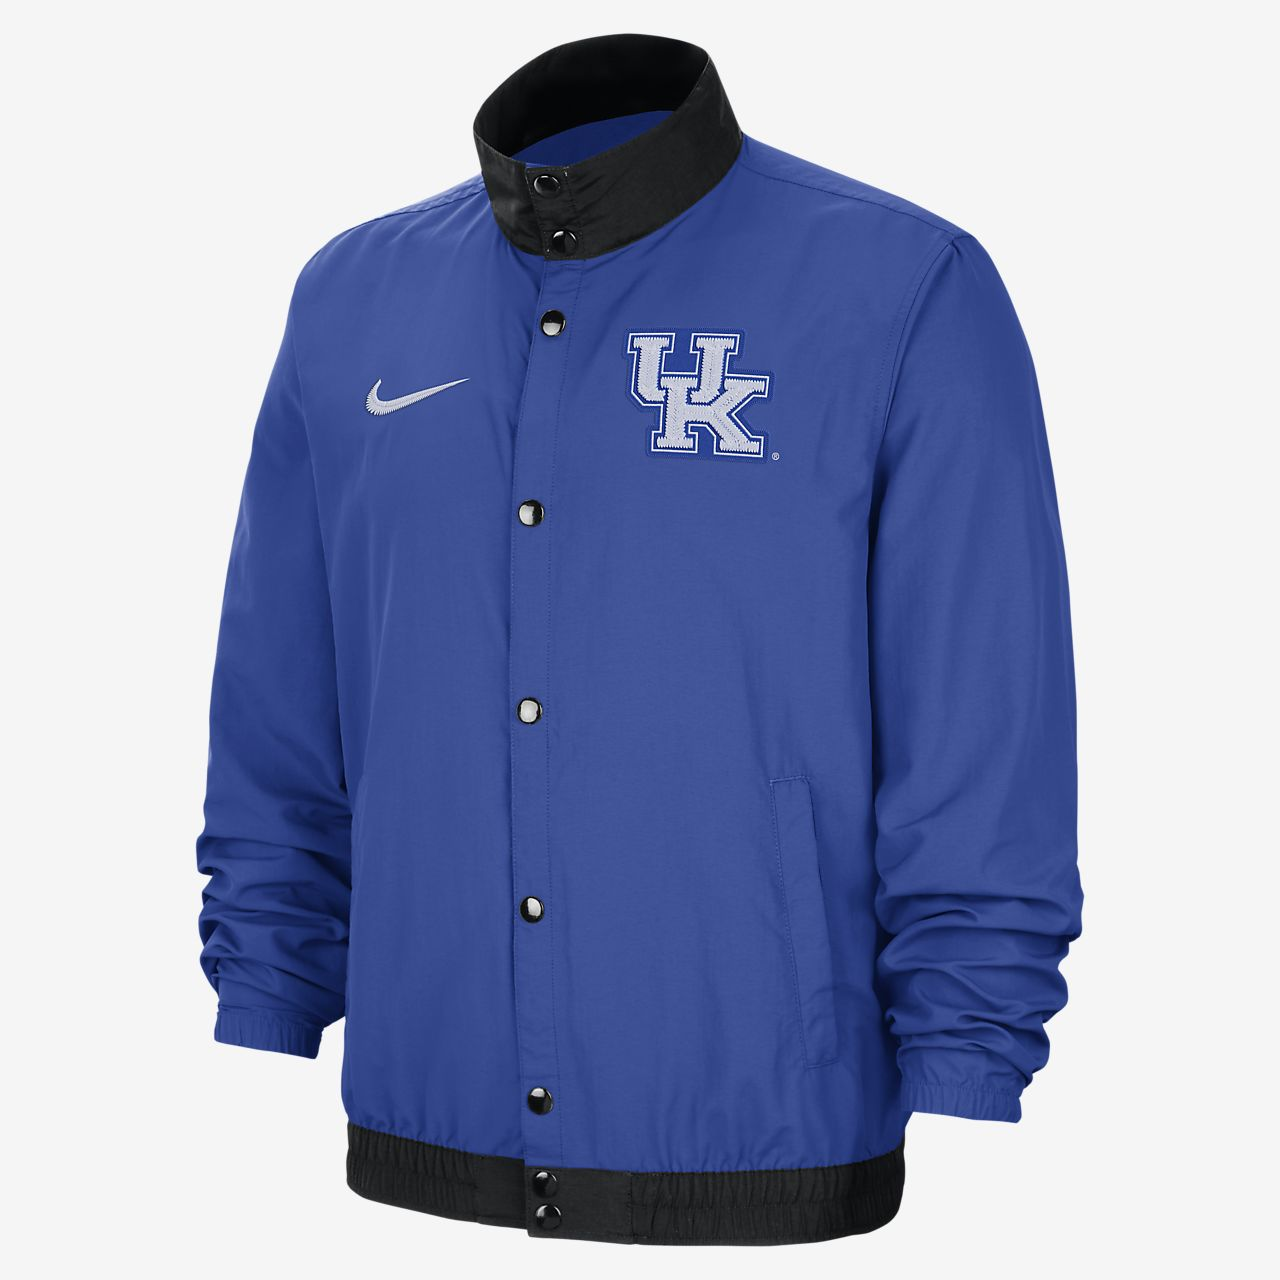 Nike College Dri-FIT (Kentucky) Men's Jacket